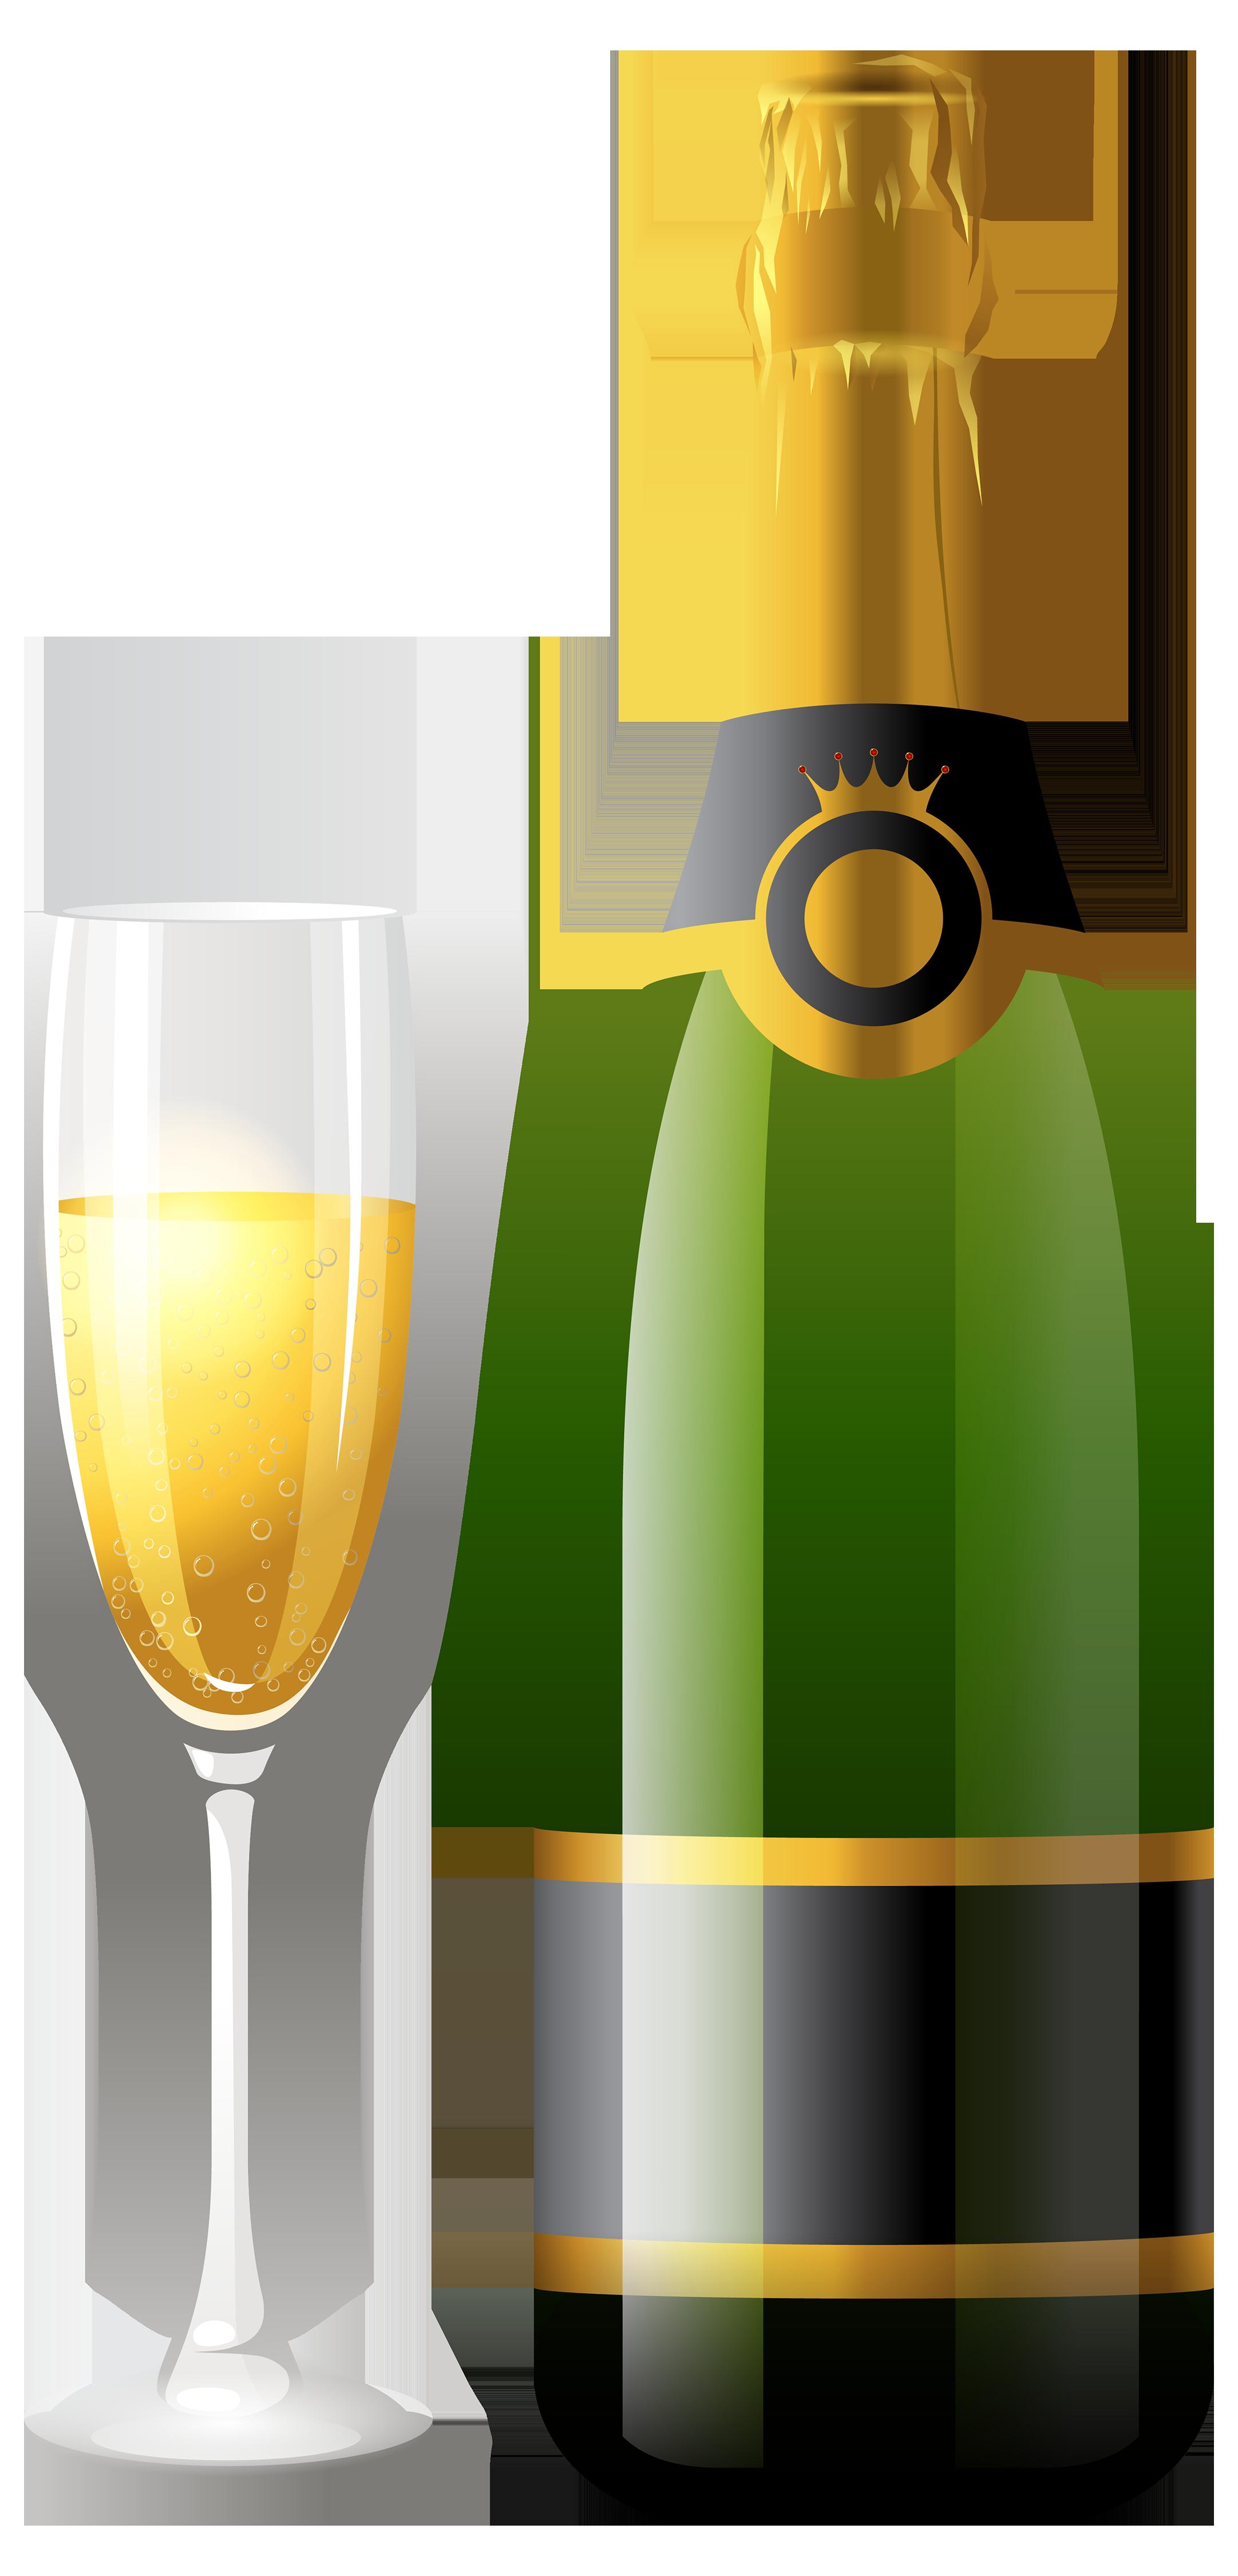 champagne clipart bottle glasses szukaj w google r ne rh pinterest com champagne bottle and glasses clipart Pink Champagne Bottle Clip Art